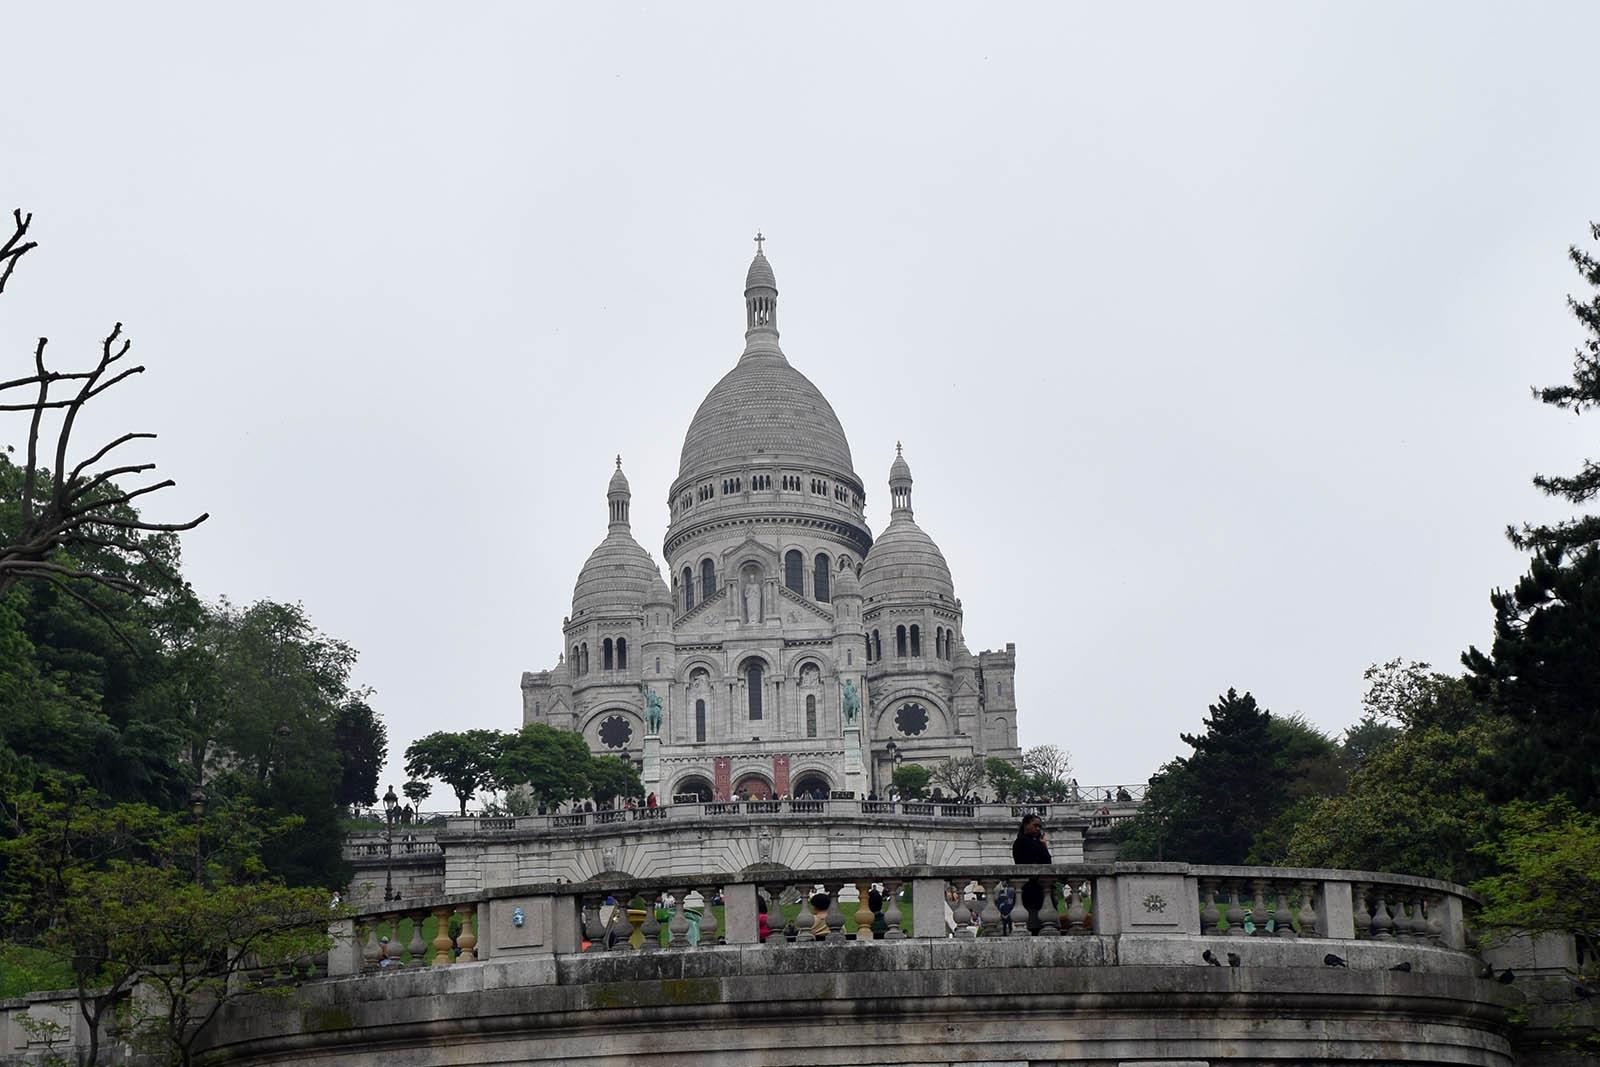 Budgettips Parijs - Sacré Coeur in Parijs